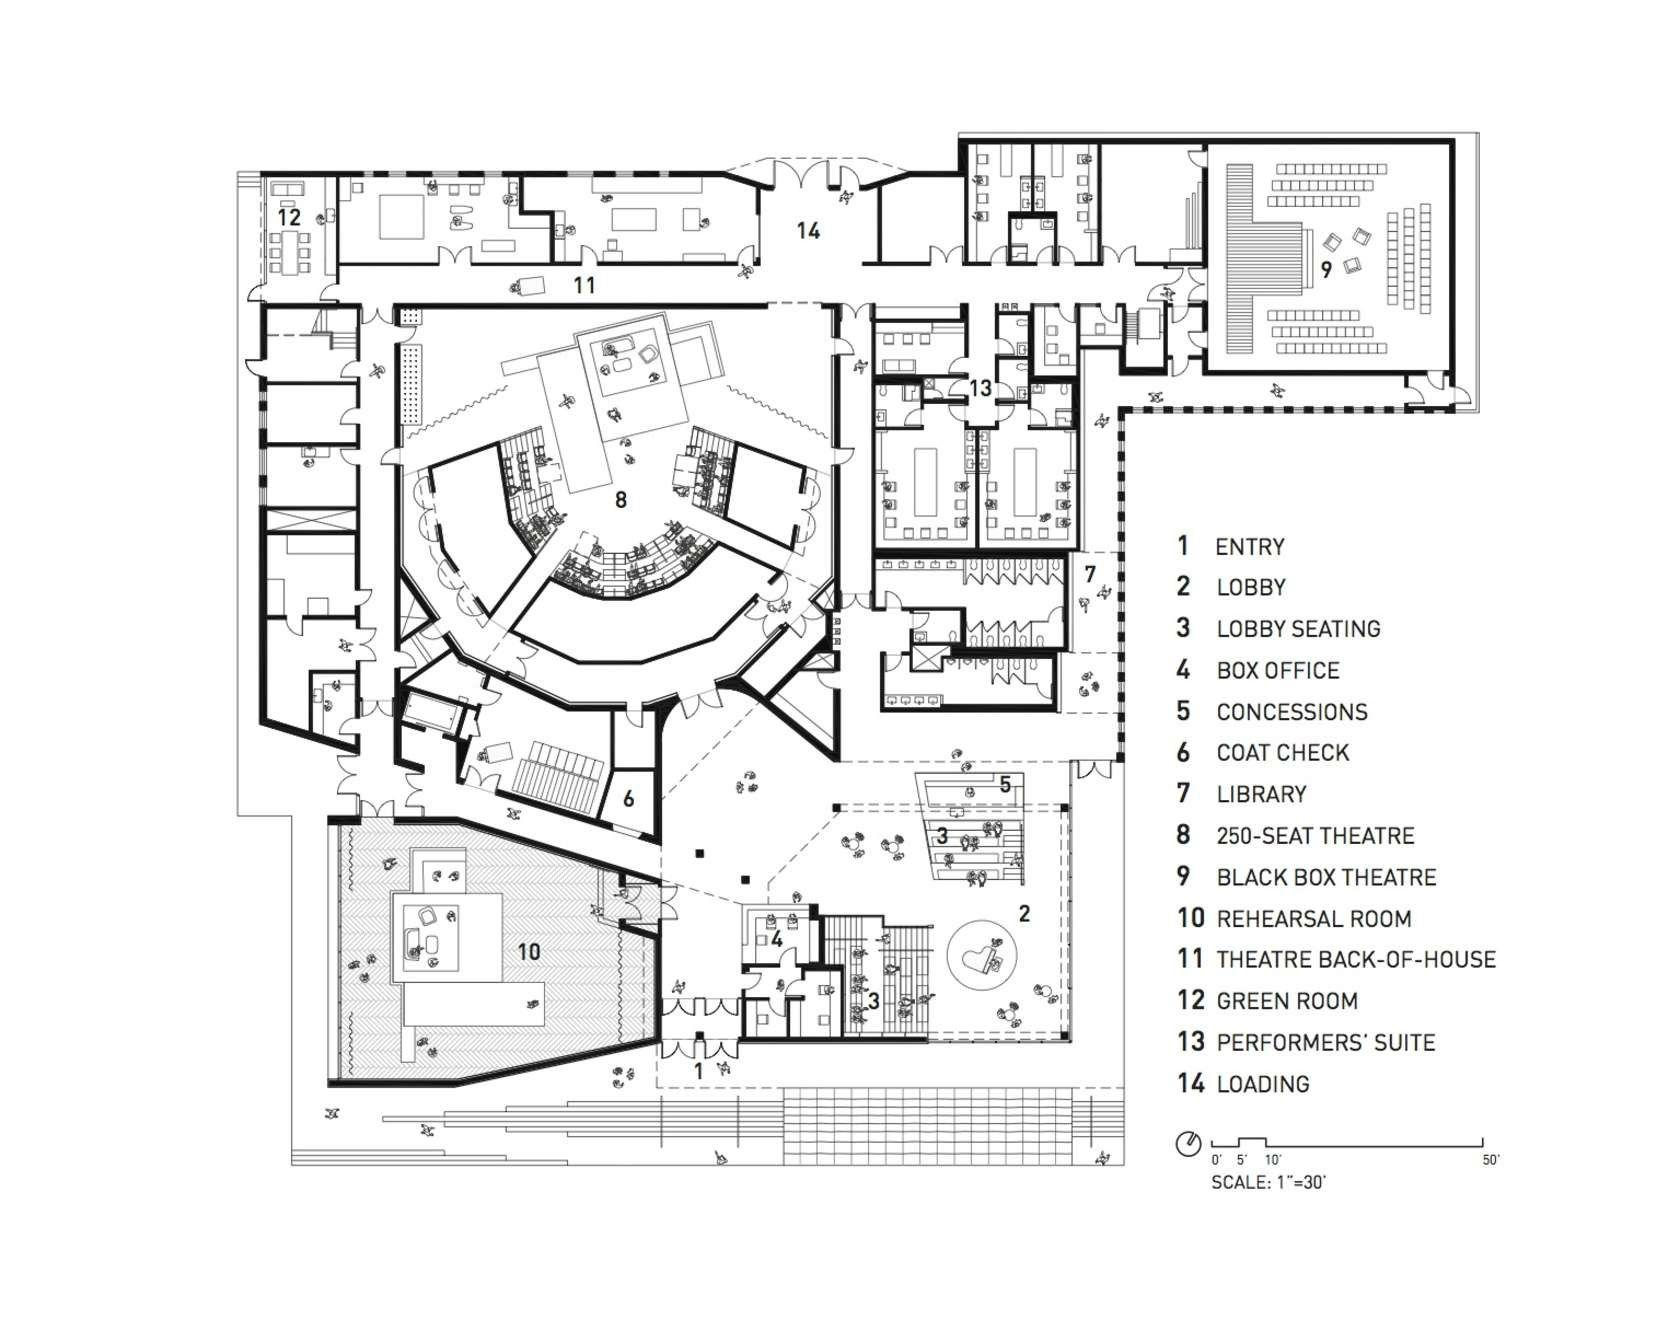 Writers Theatre Theatre Architecture Theatre How To Plan